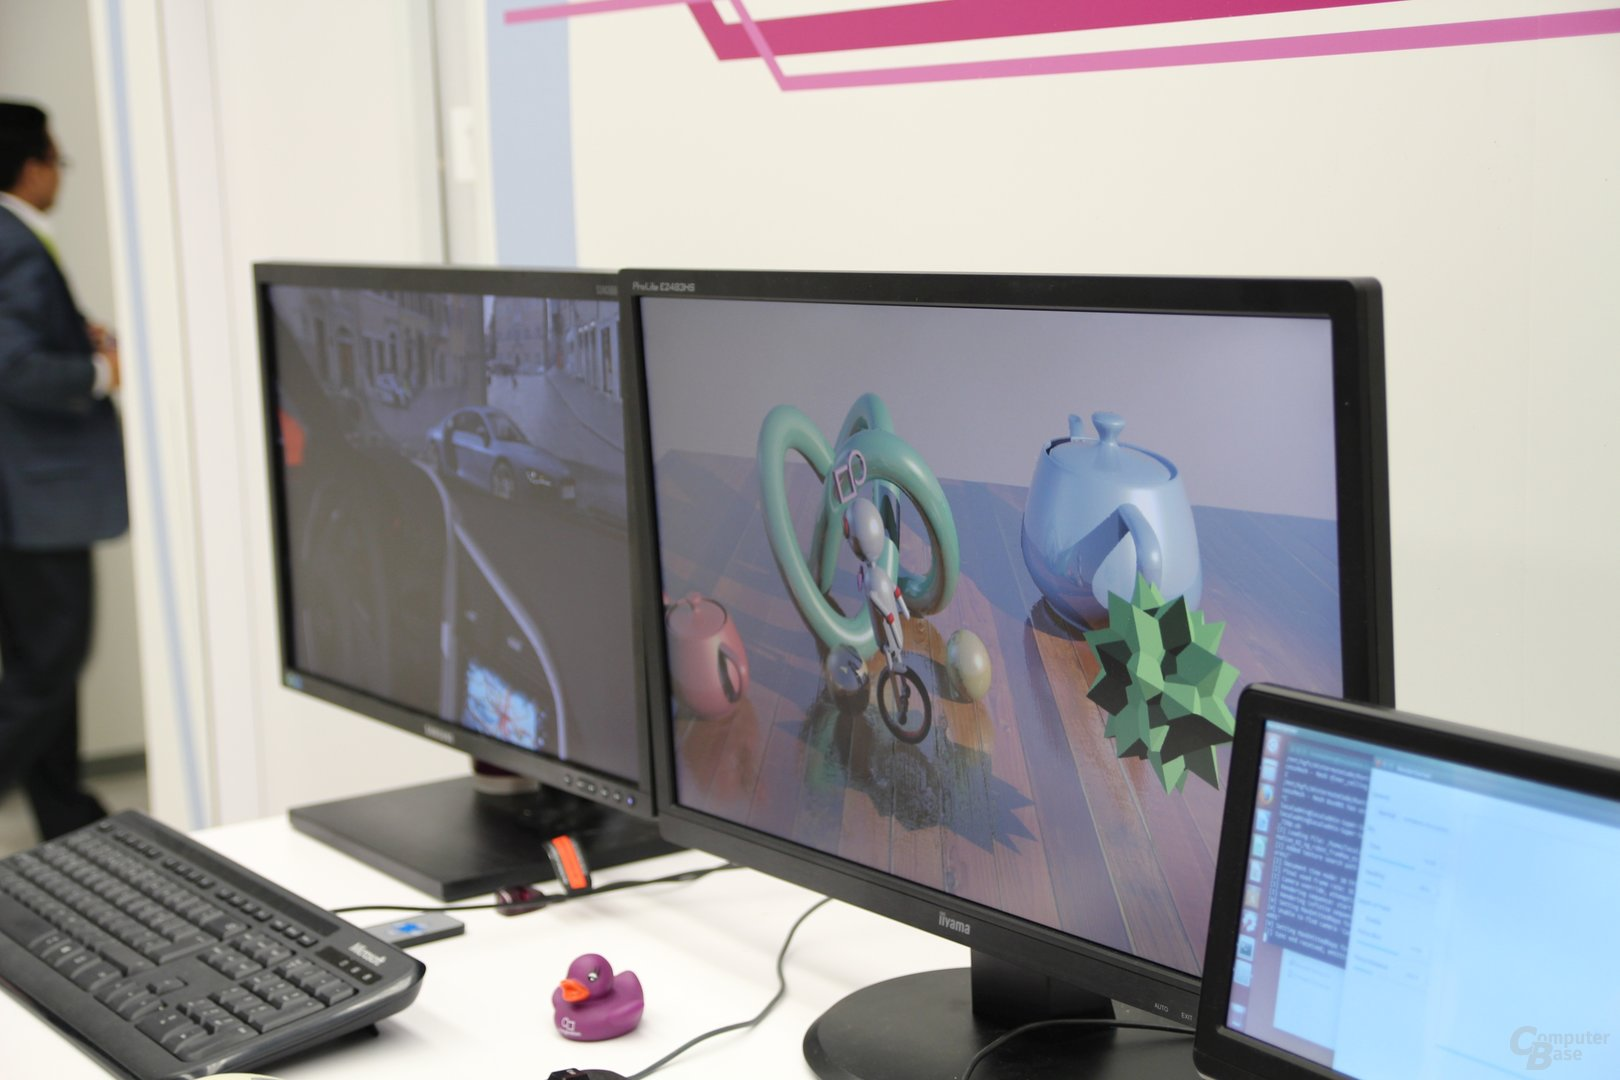 Demo der GPU